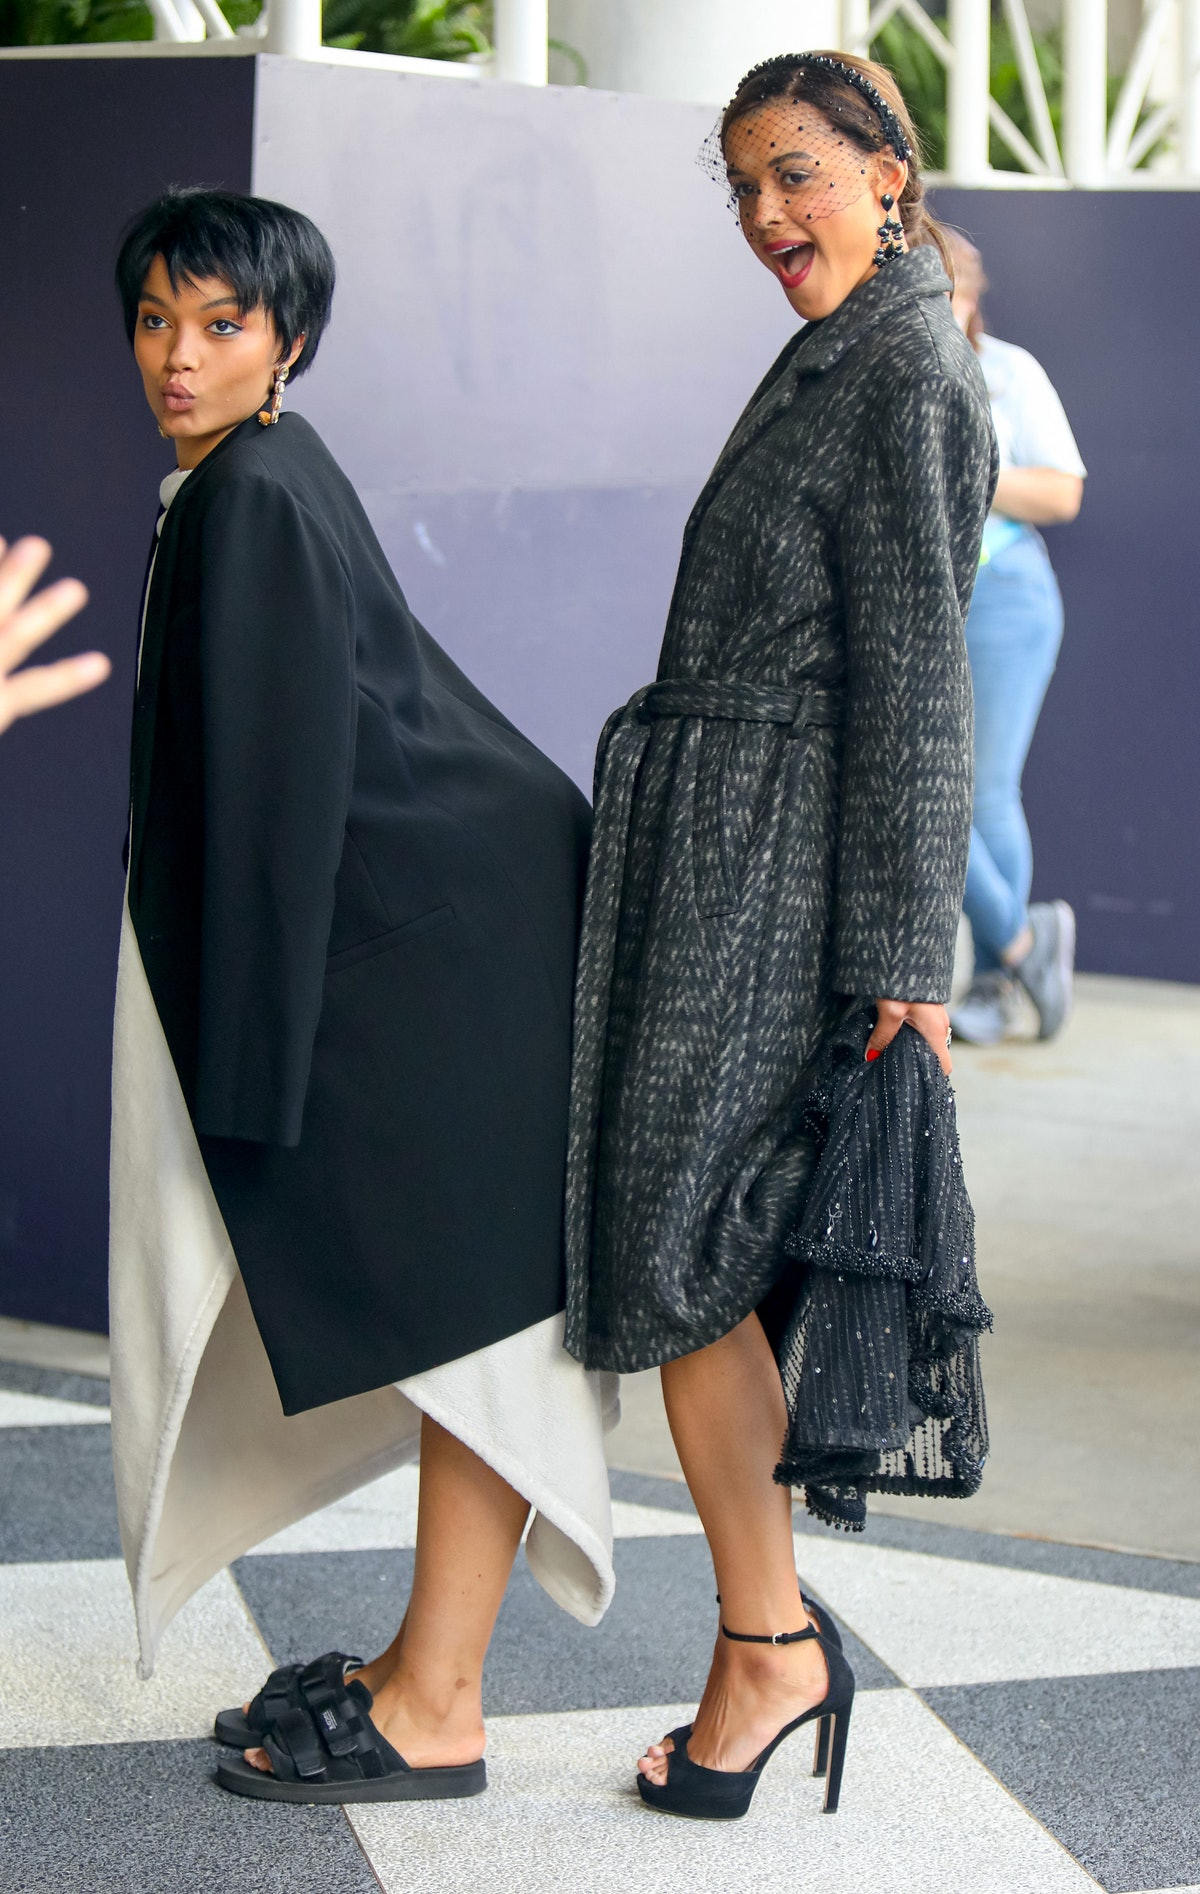 Whitney Peak and Jordan Alexander on the set of the Gossip Girl reboot